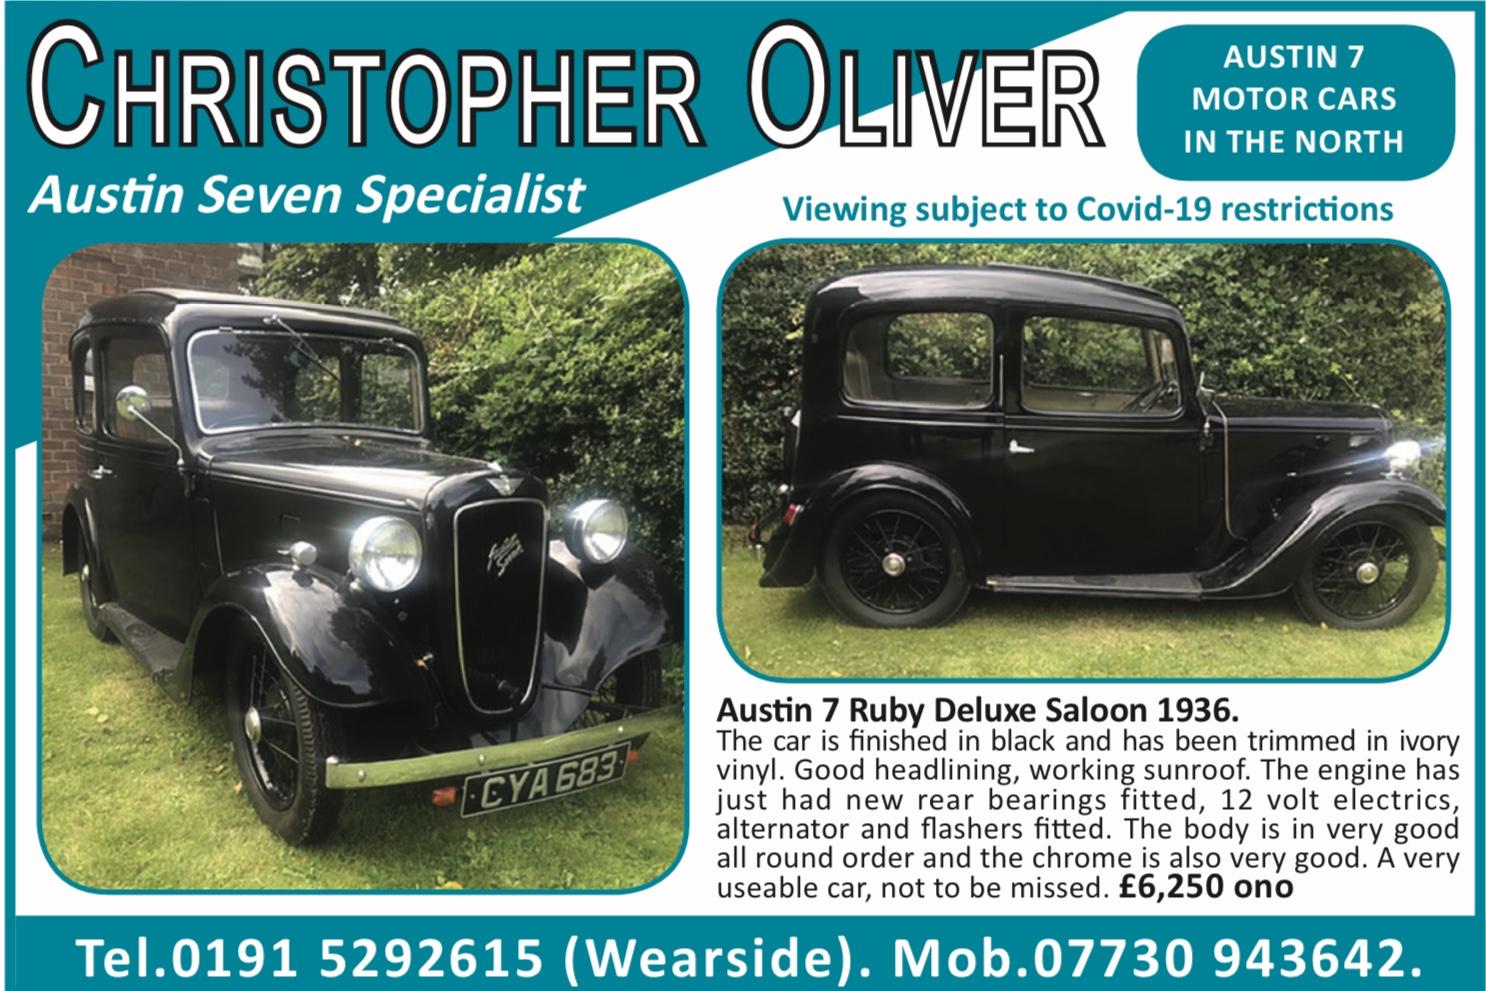 Christopher Oliver - Austin 7 Specialist, post-vintage classic cars